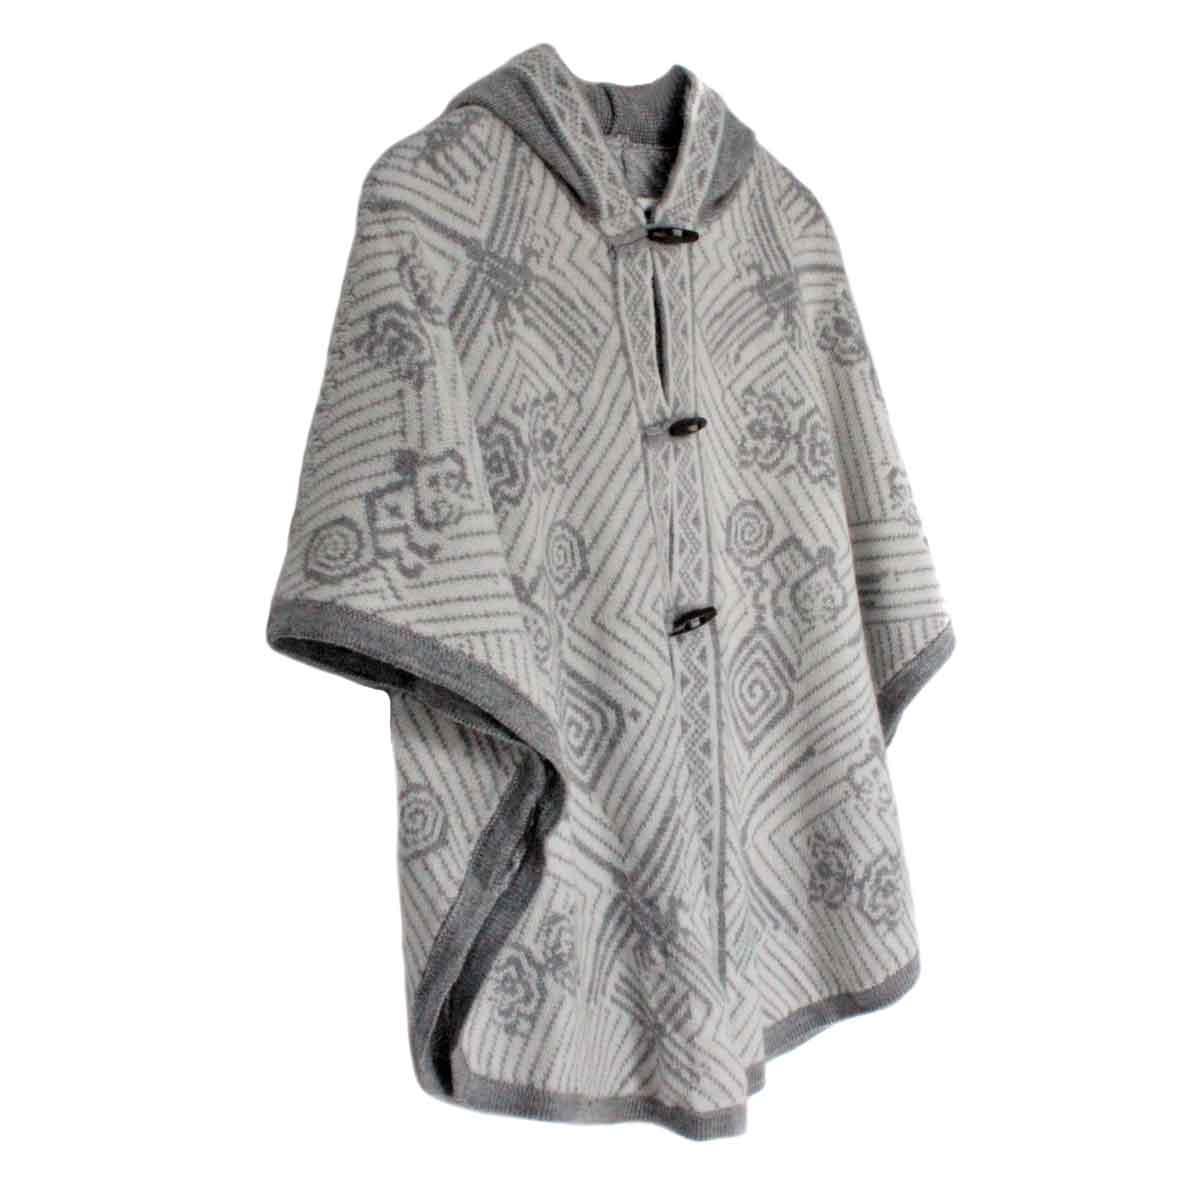 Inka-Products-Cape Alpaga HAPPINA-Blanc Motifs Ethniques-2